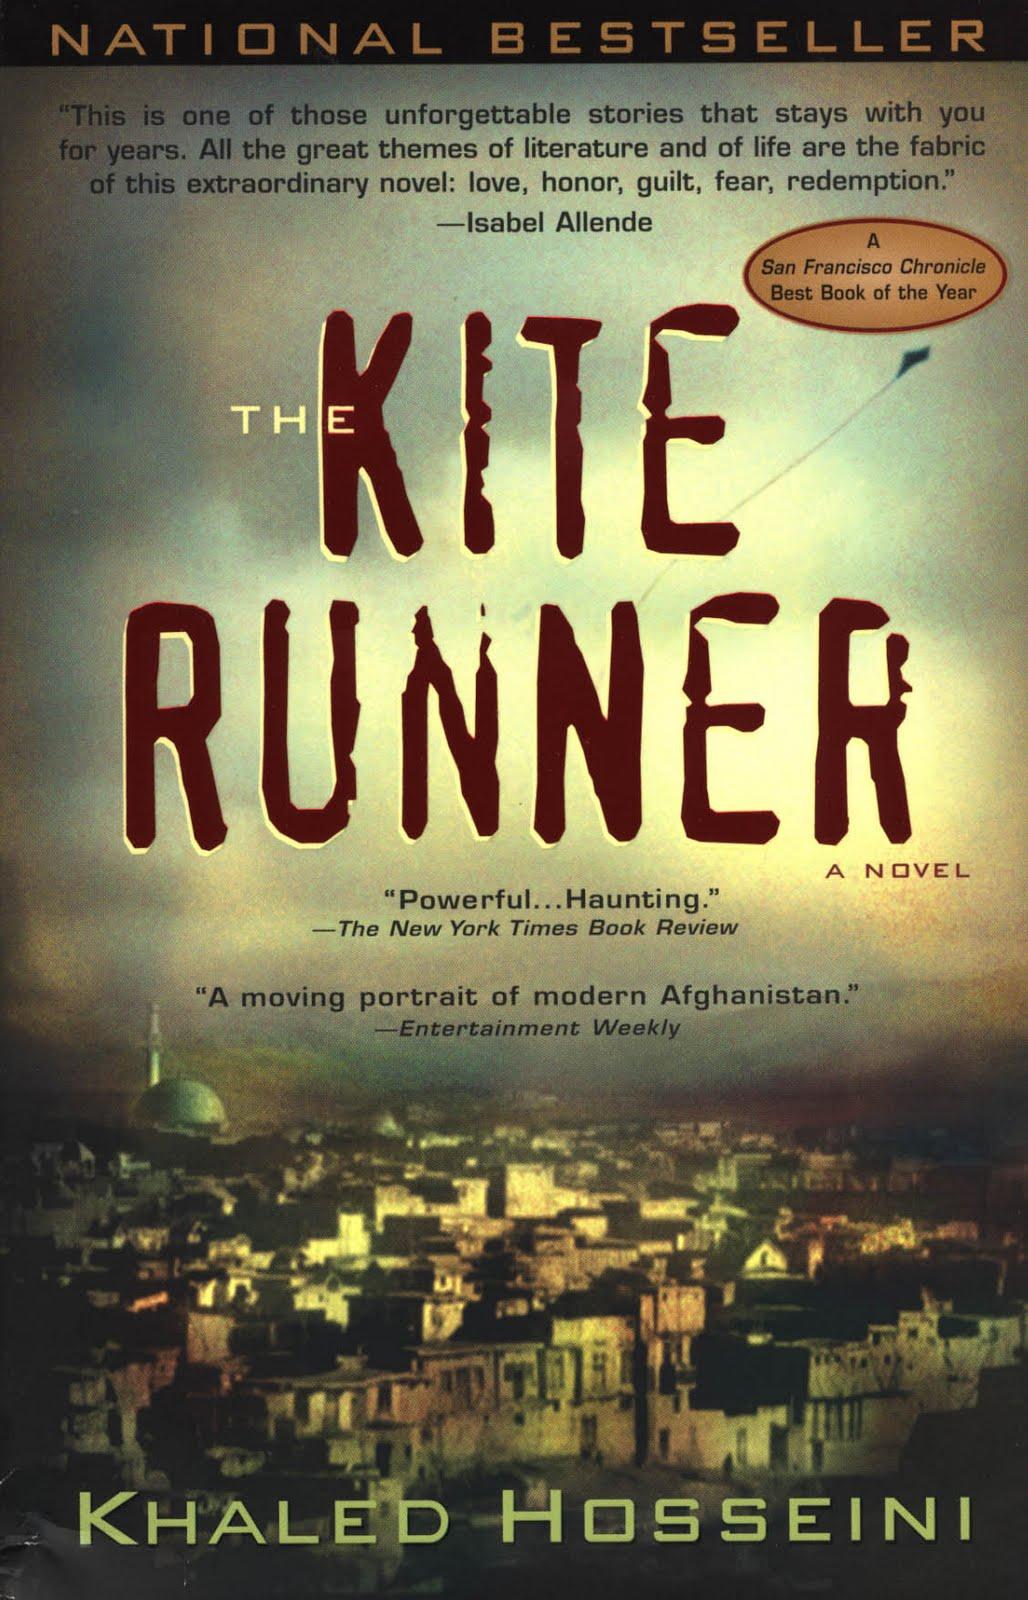 http://2.bp.blogspot.com/-nwQ6i-dLgrQ/TWJy_31S4pI/AAAAAAAAGNE/xR_rtUvHxEo/s1600/kite-runner-book-jacket.jpg